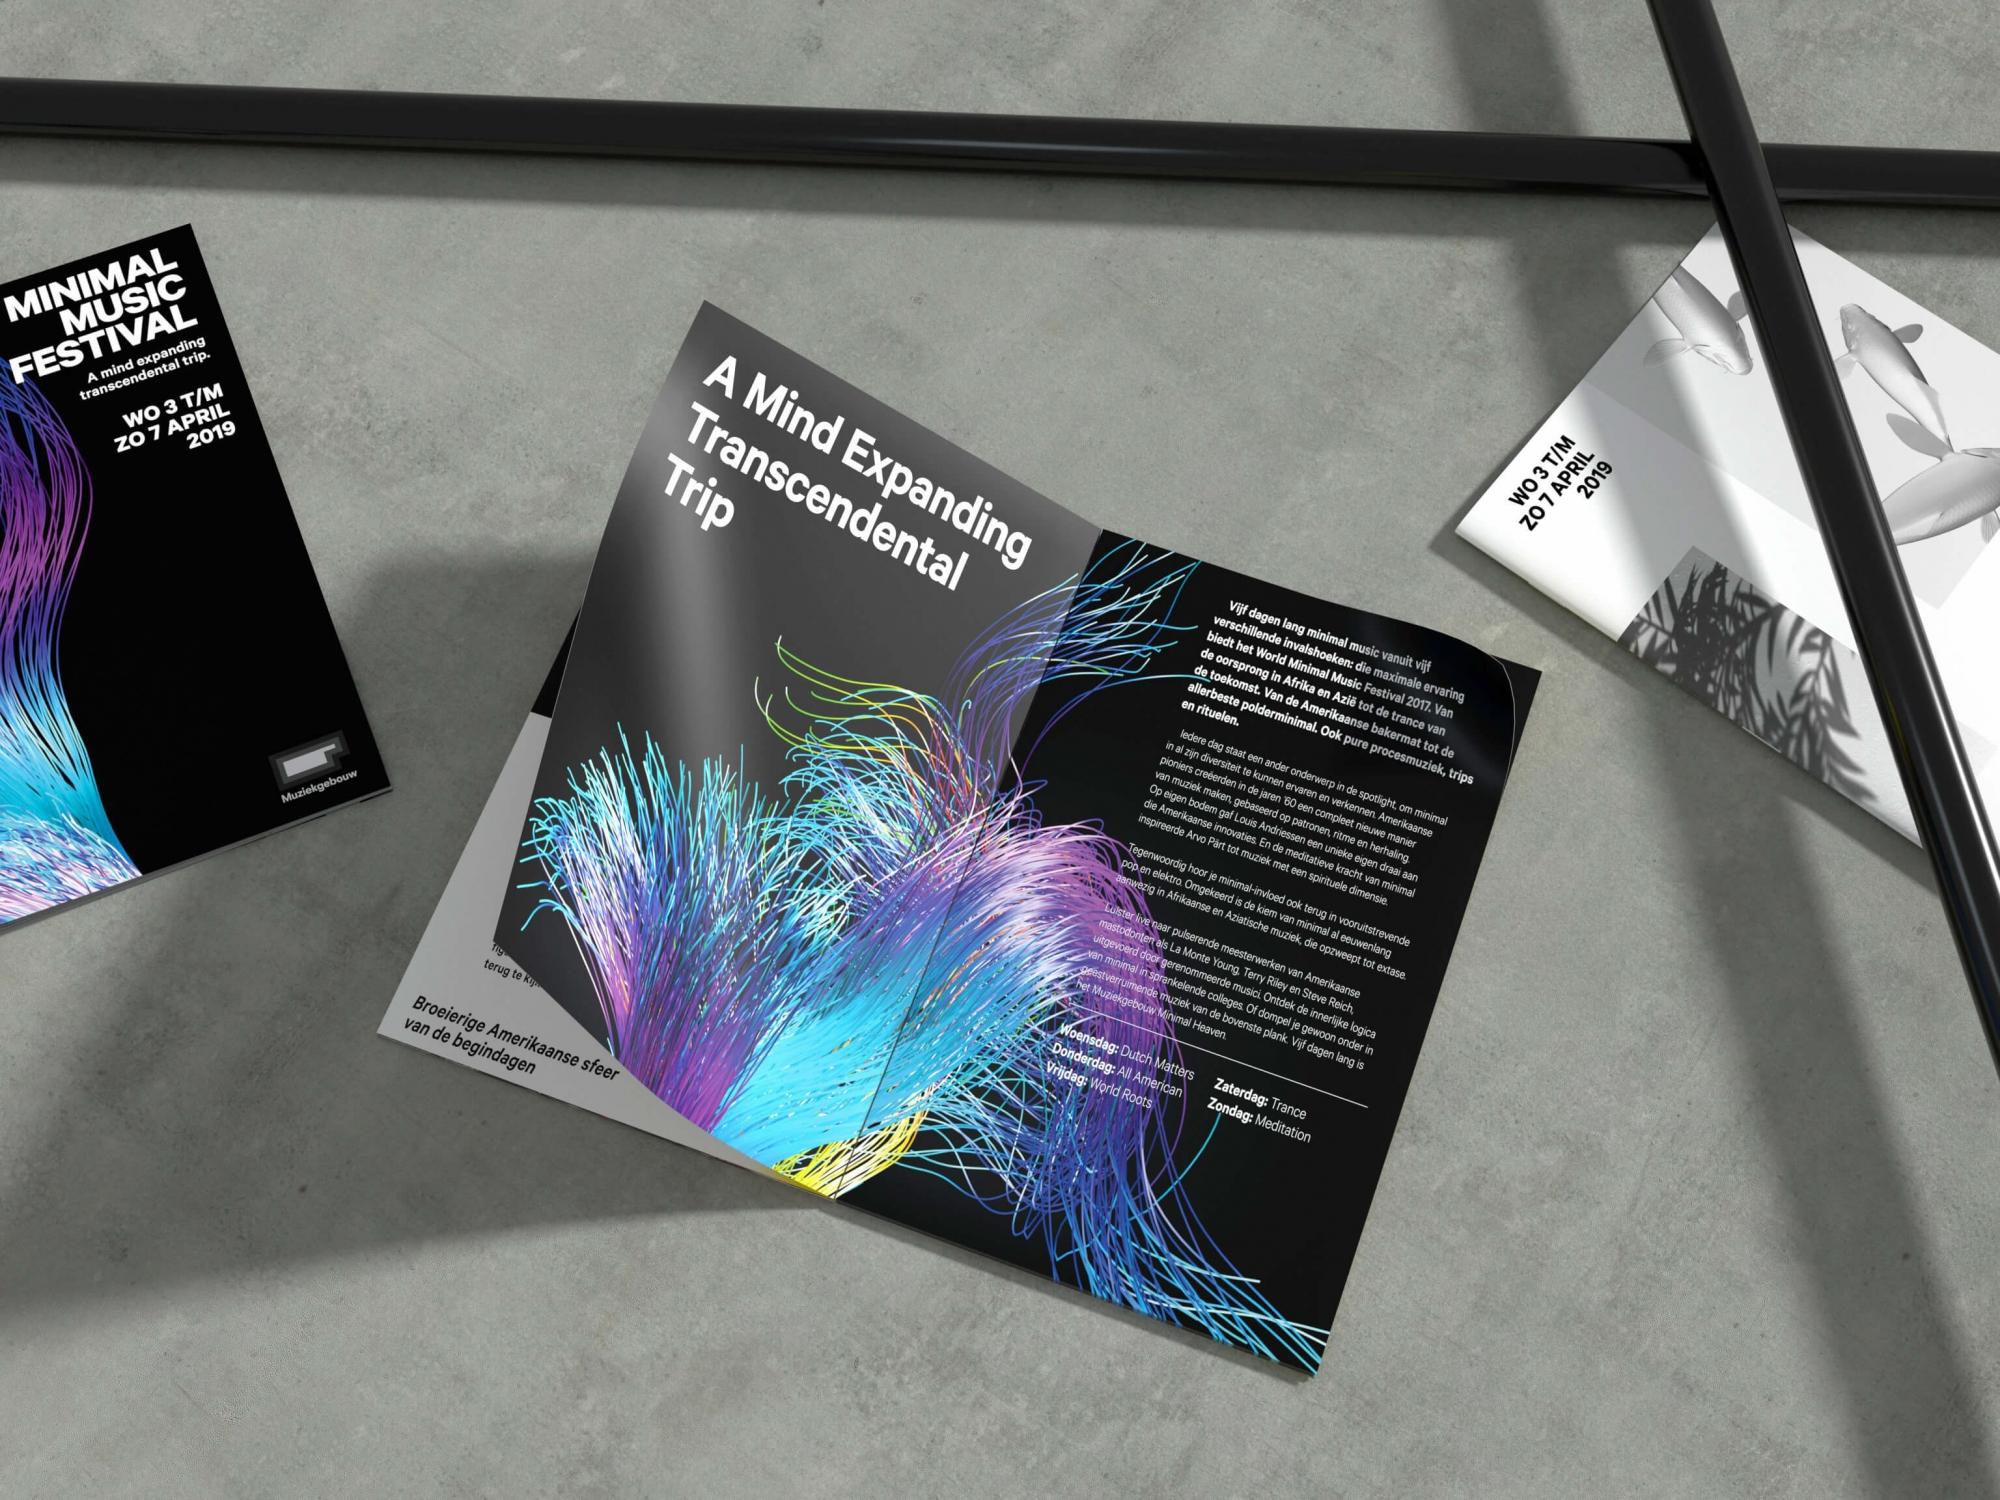 Wandplank Met La.Minimal Music Festival Identity Aiga1 Eye On Design